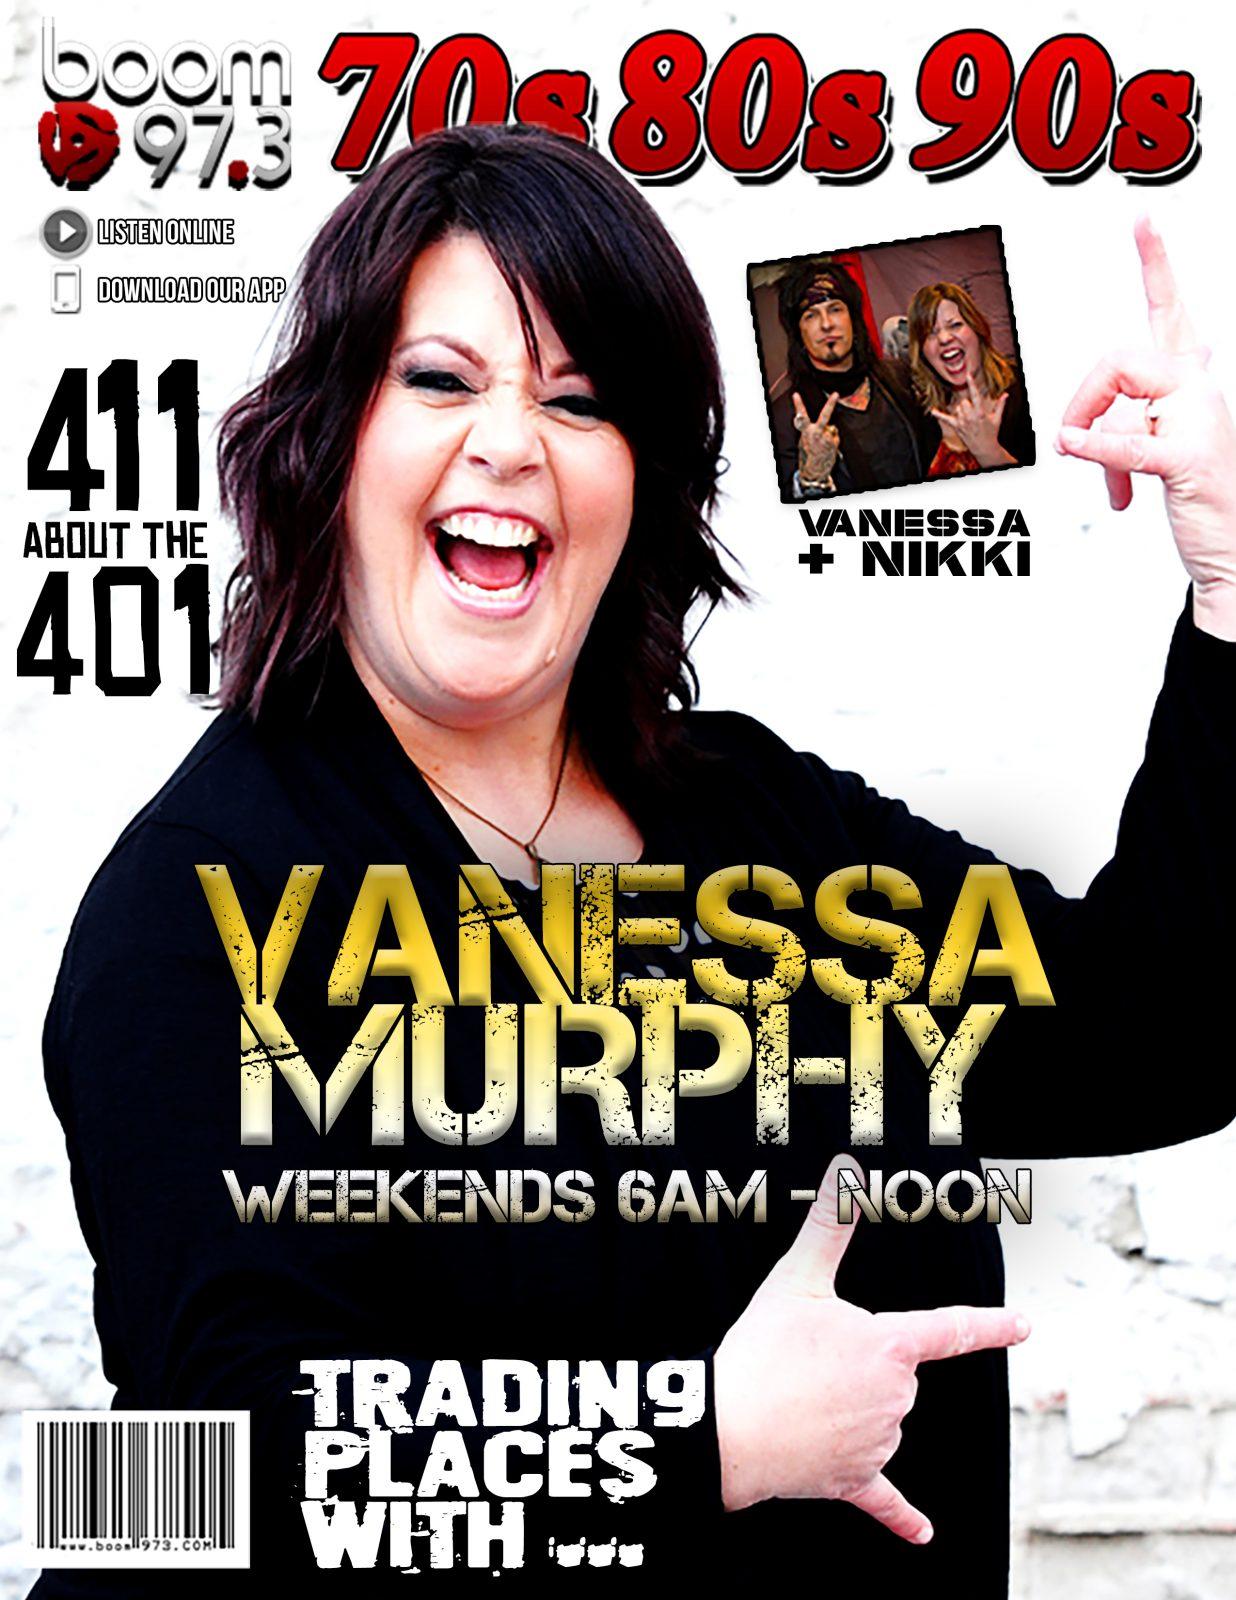 vanessa-magazinecover-8x11